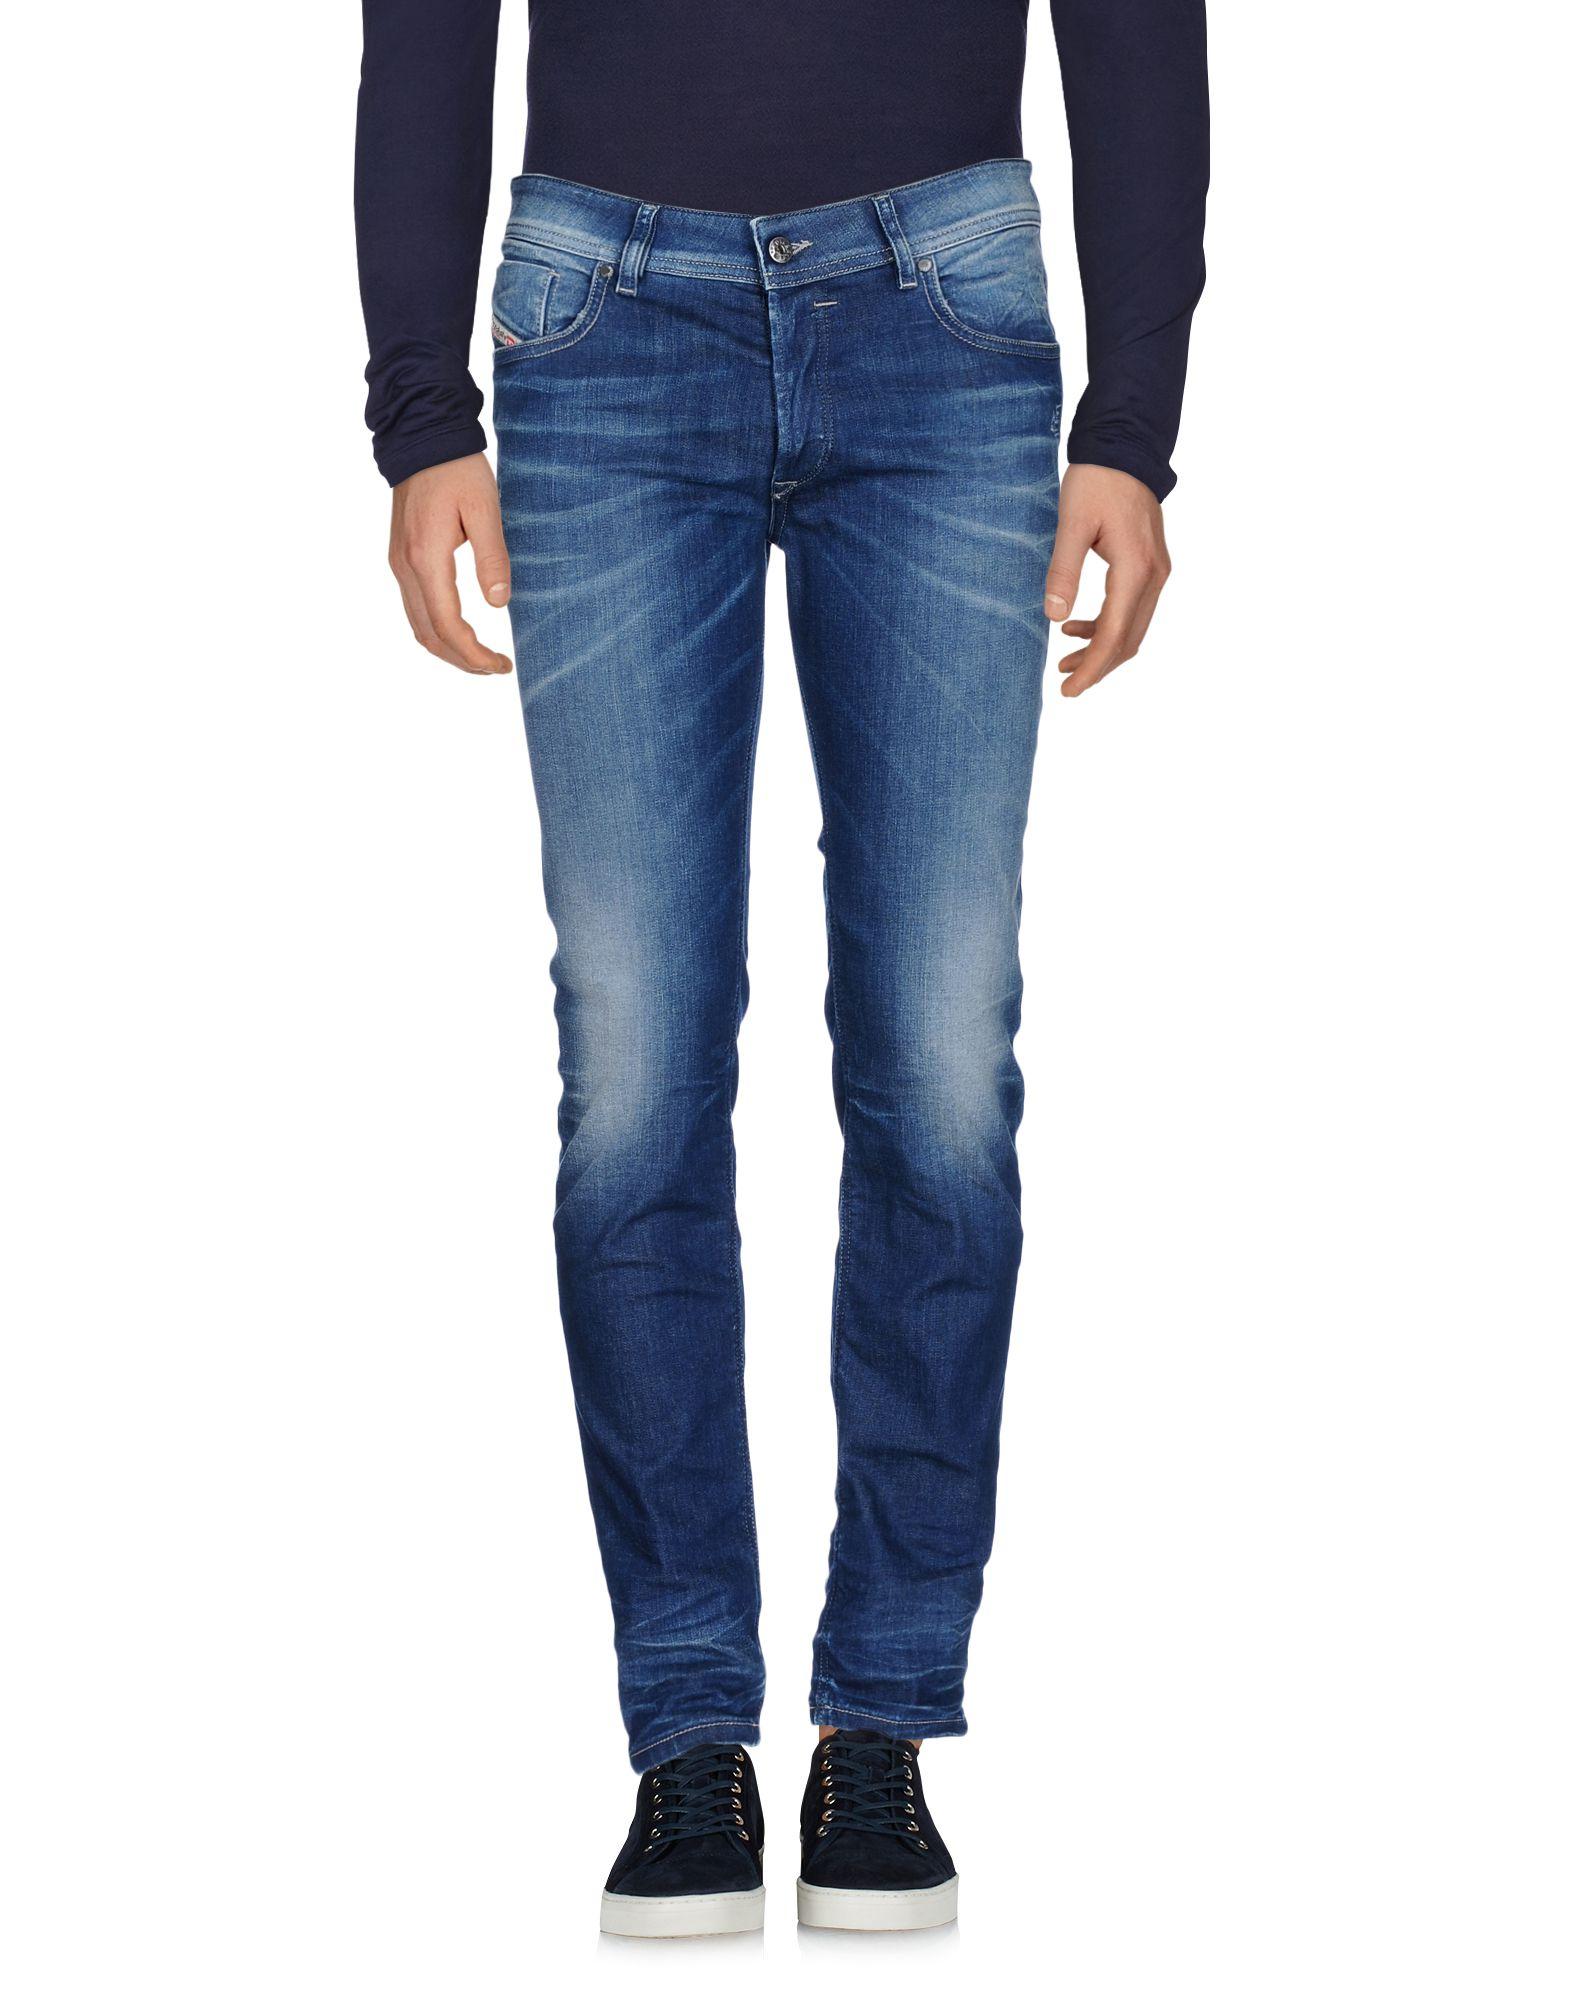 DIESEL Herren Jeanshose Farbe Blau Größe 8